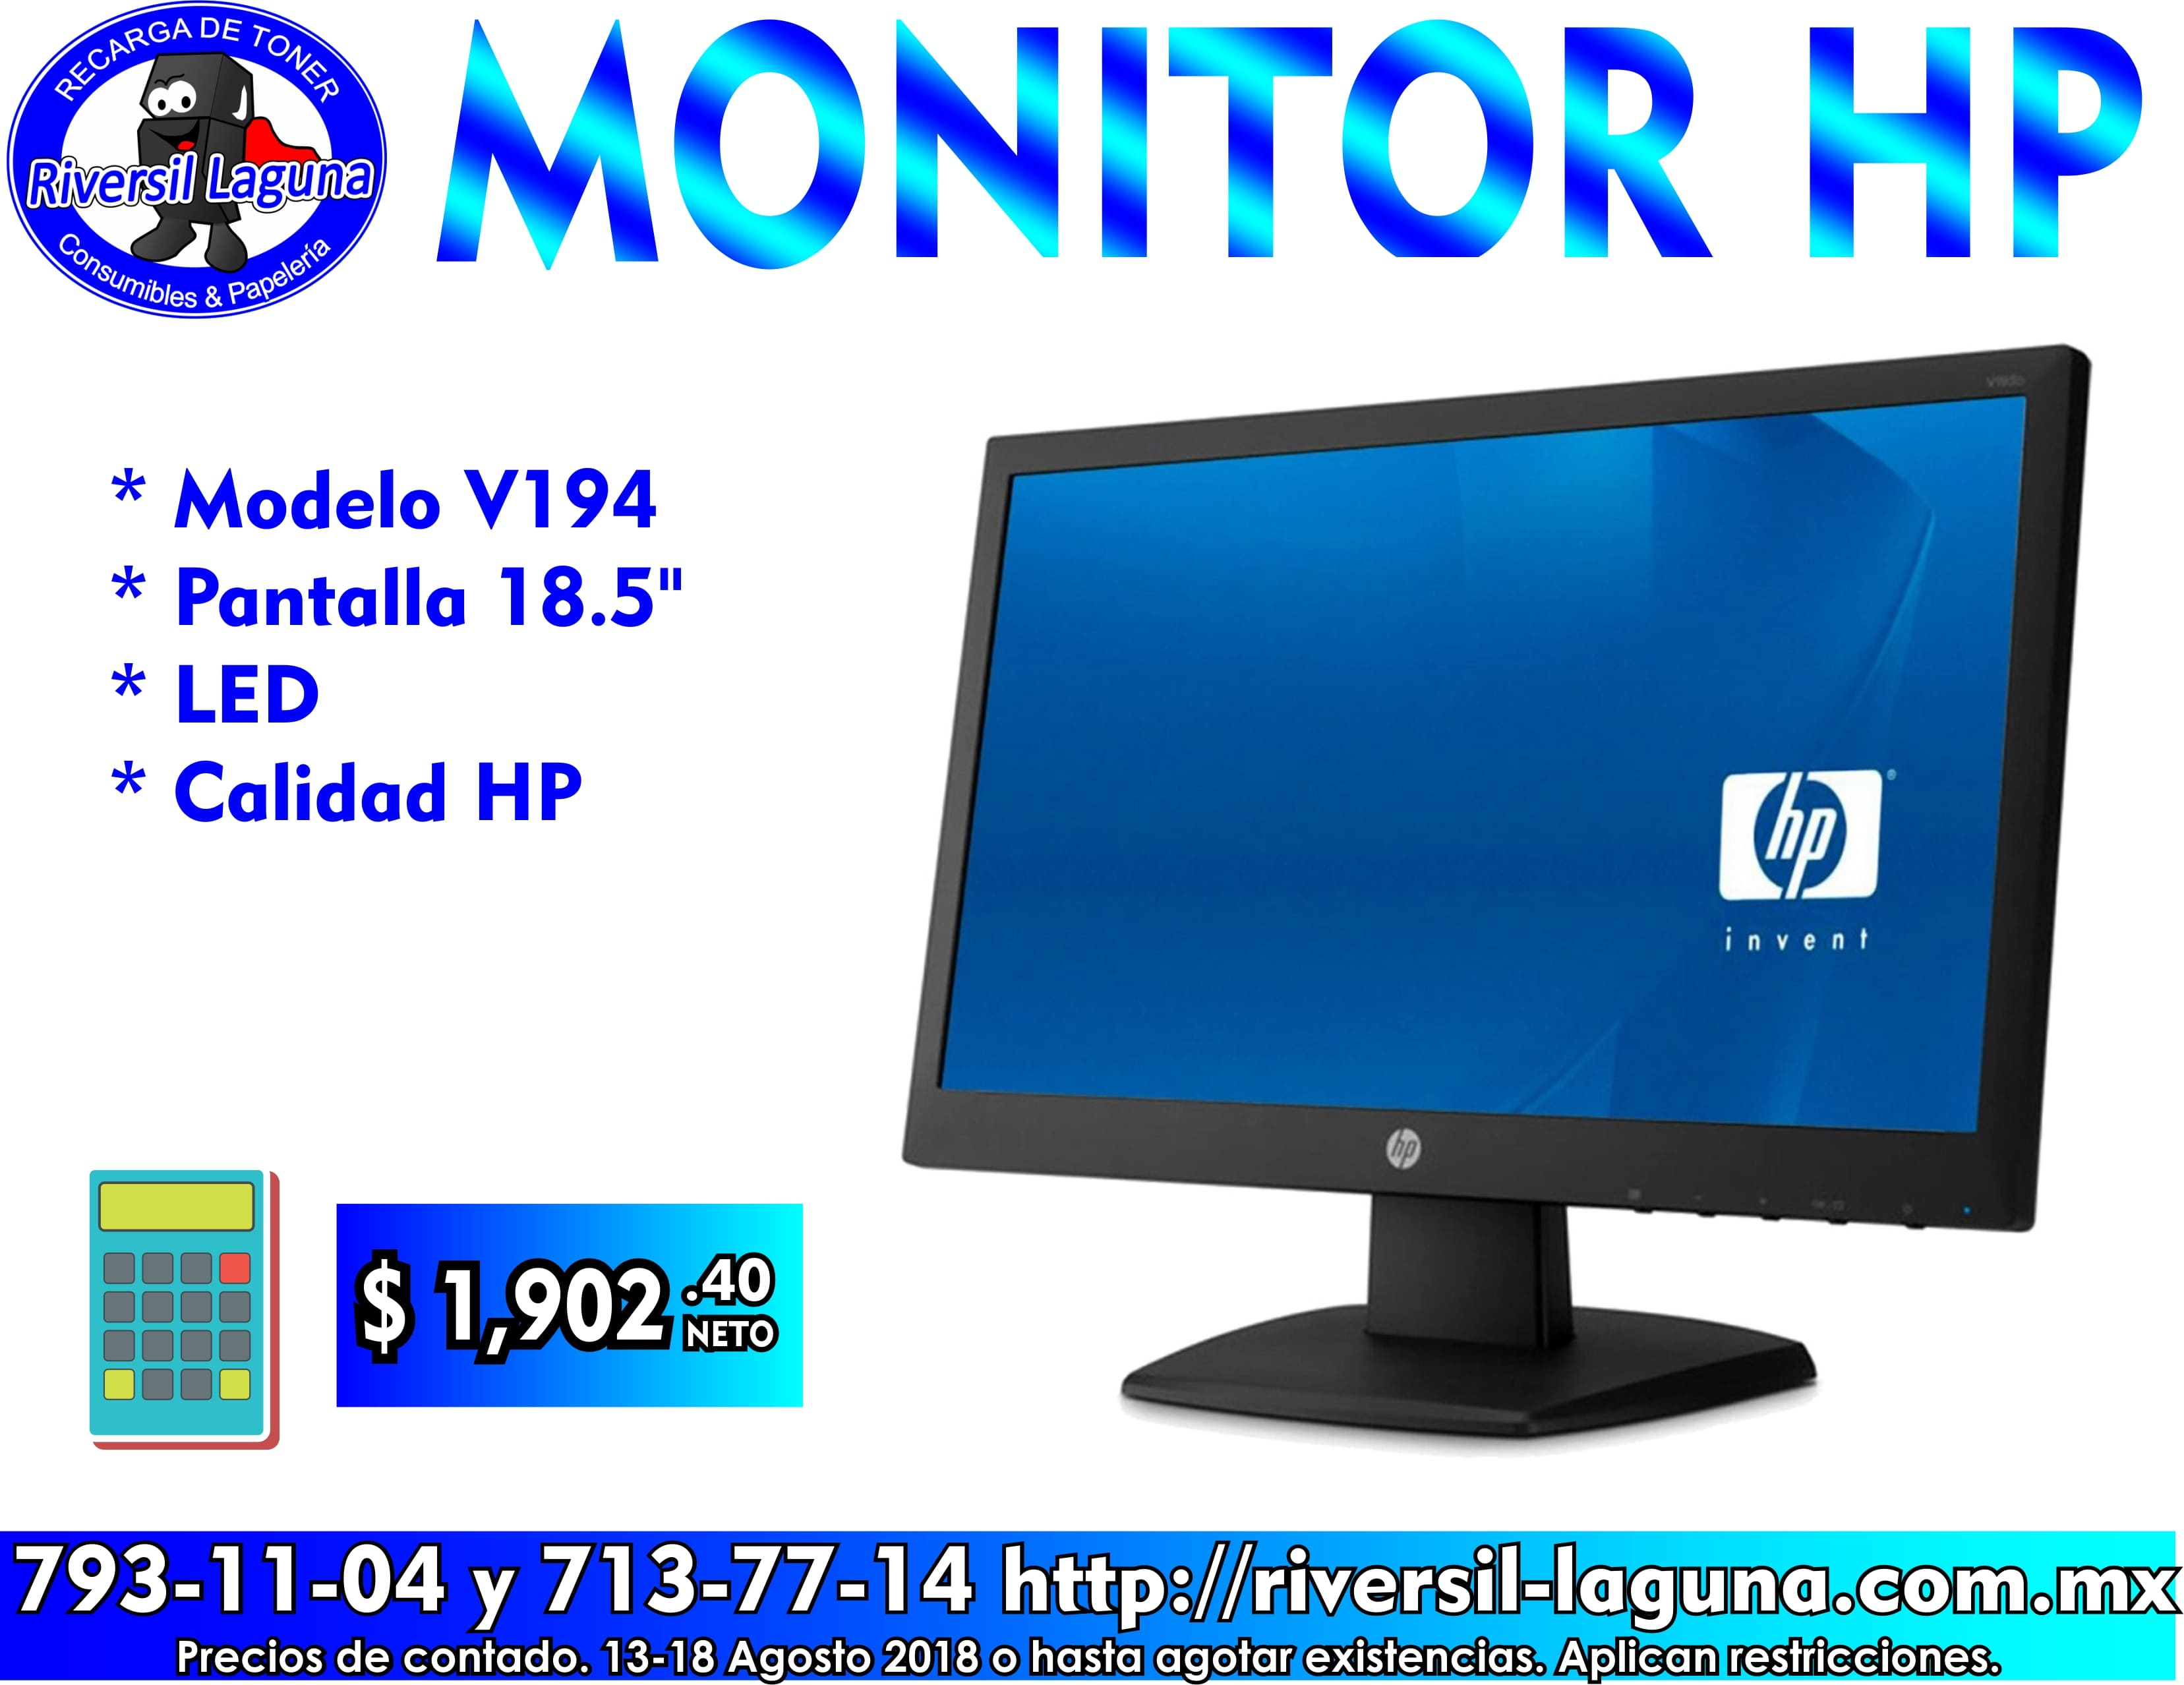 MONITOR HP V194